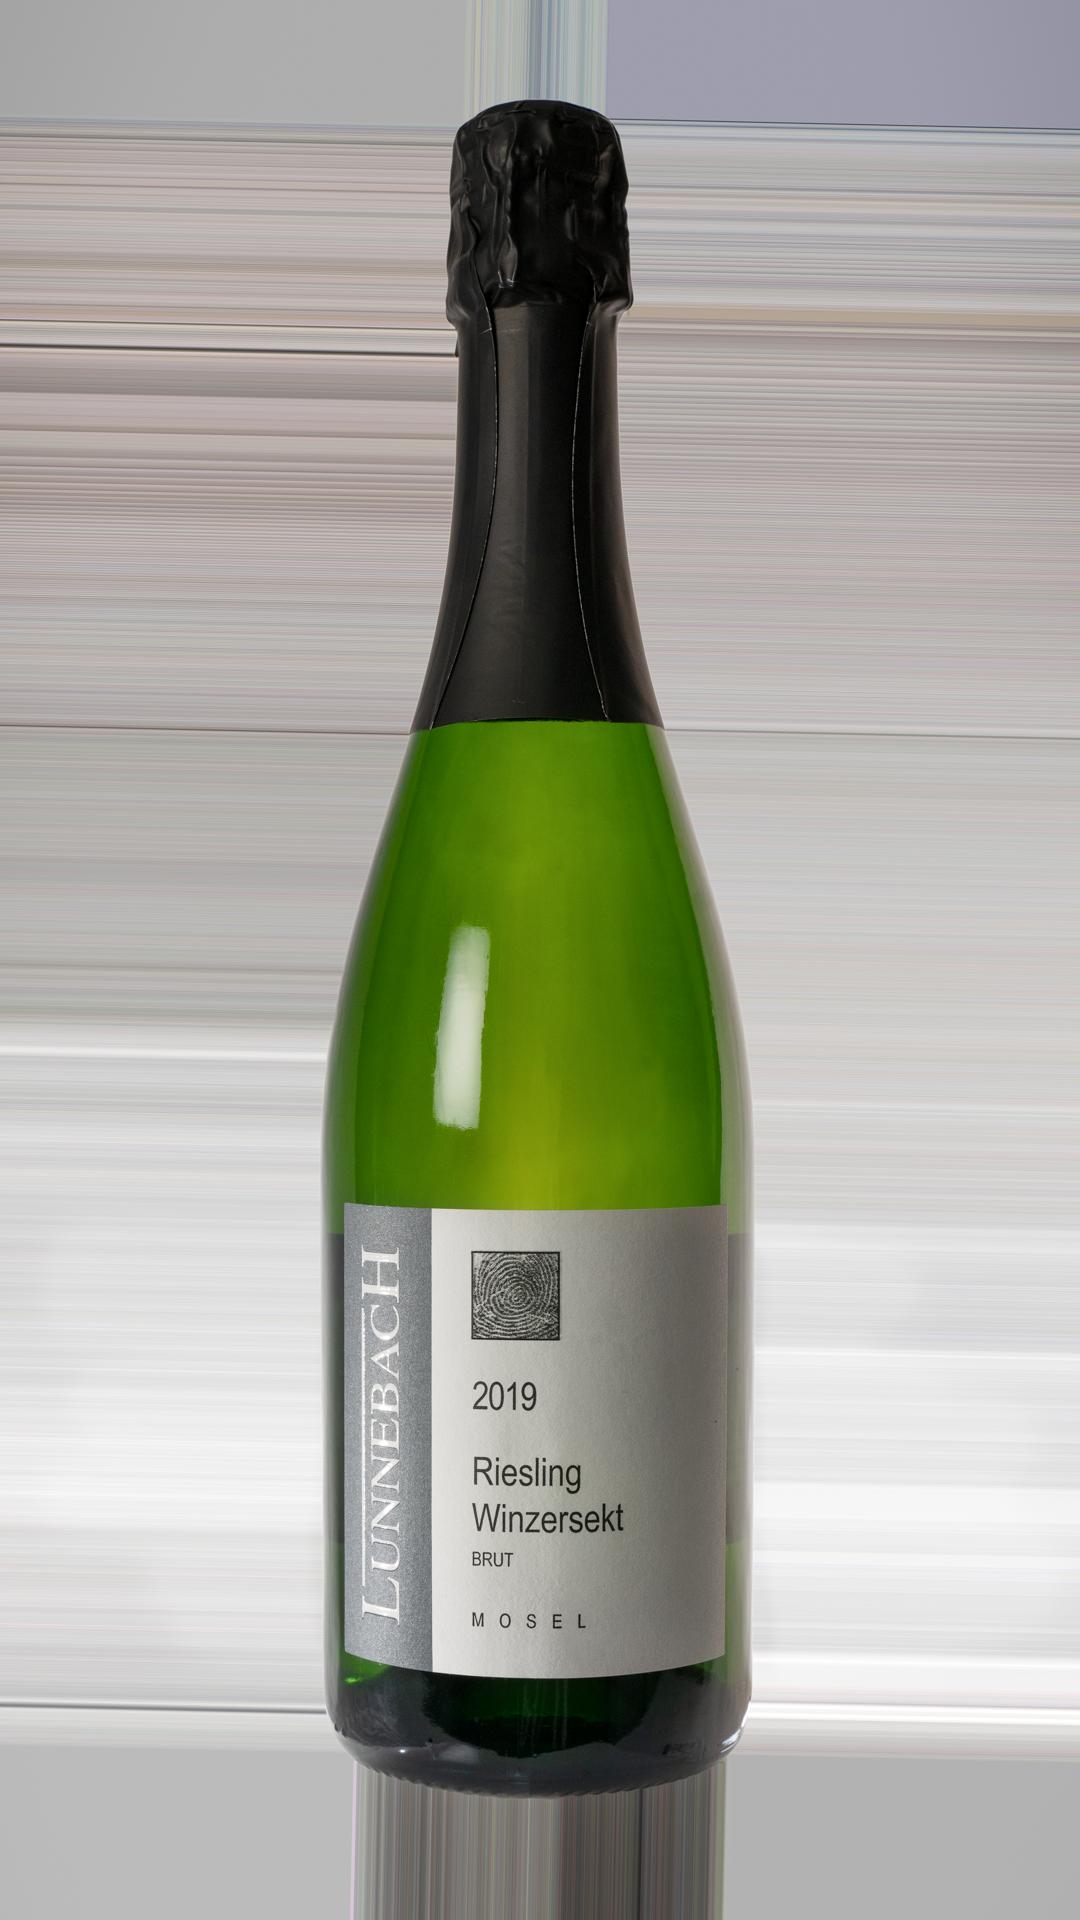 2019 Riesling-Winzersekt brut